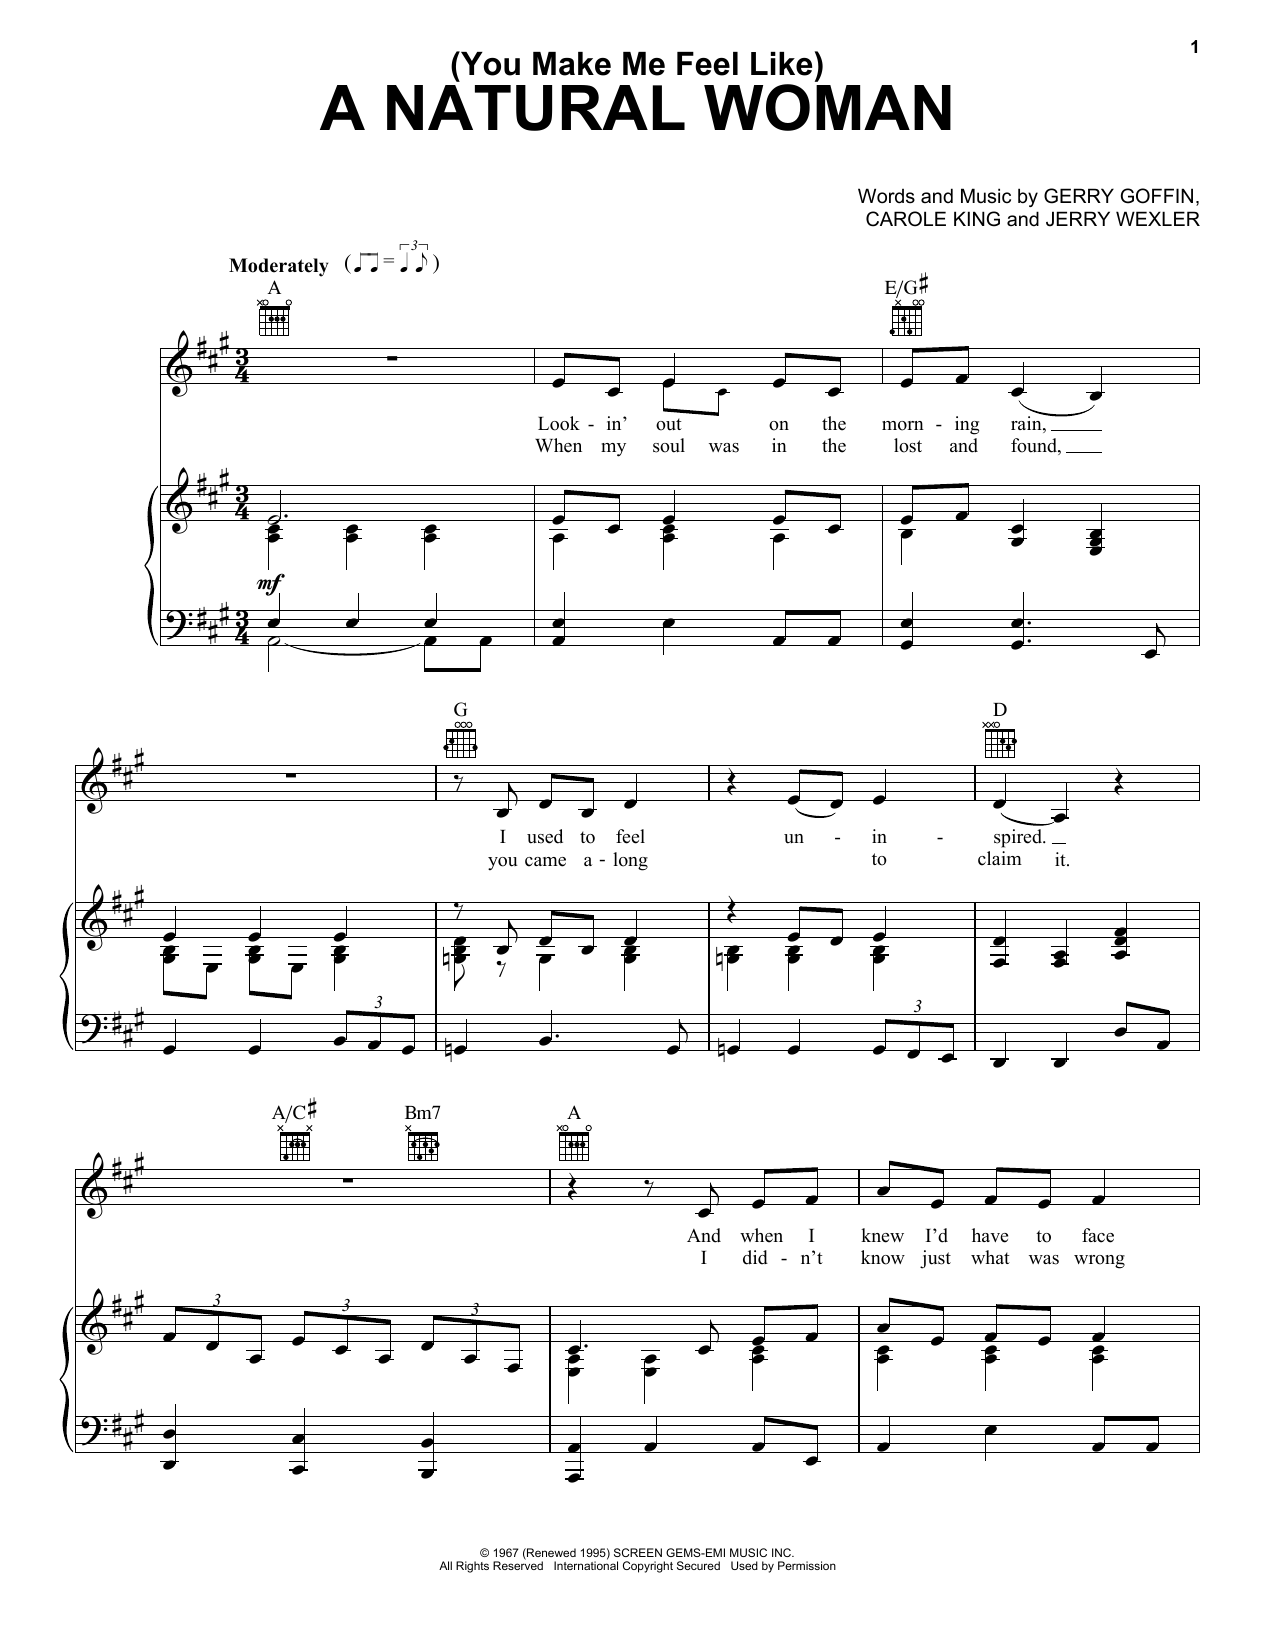 (You Make Me Feel Like) A Natural Woman sheet music